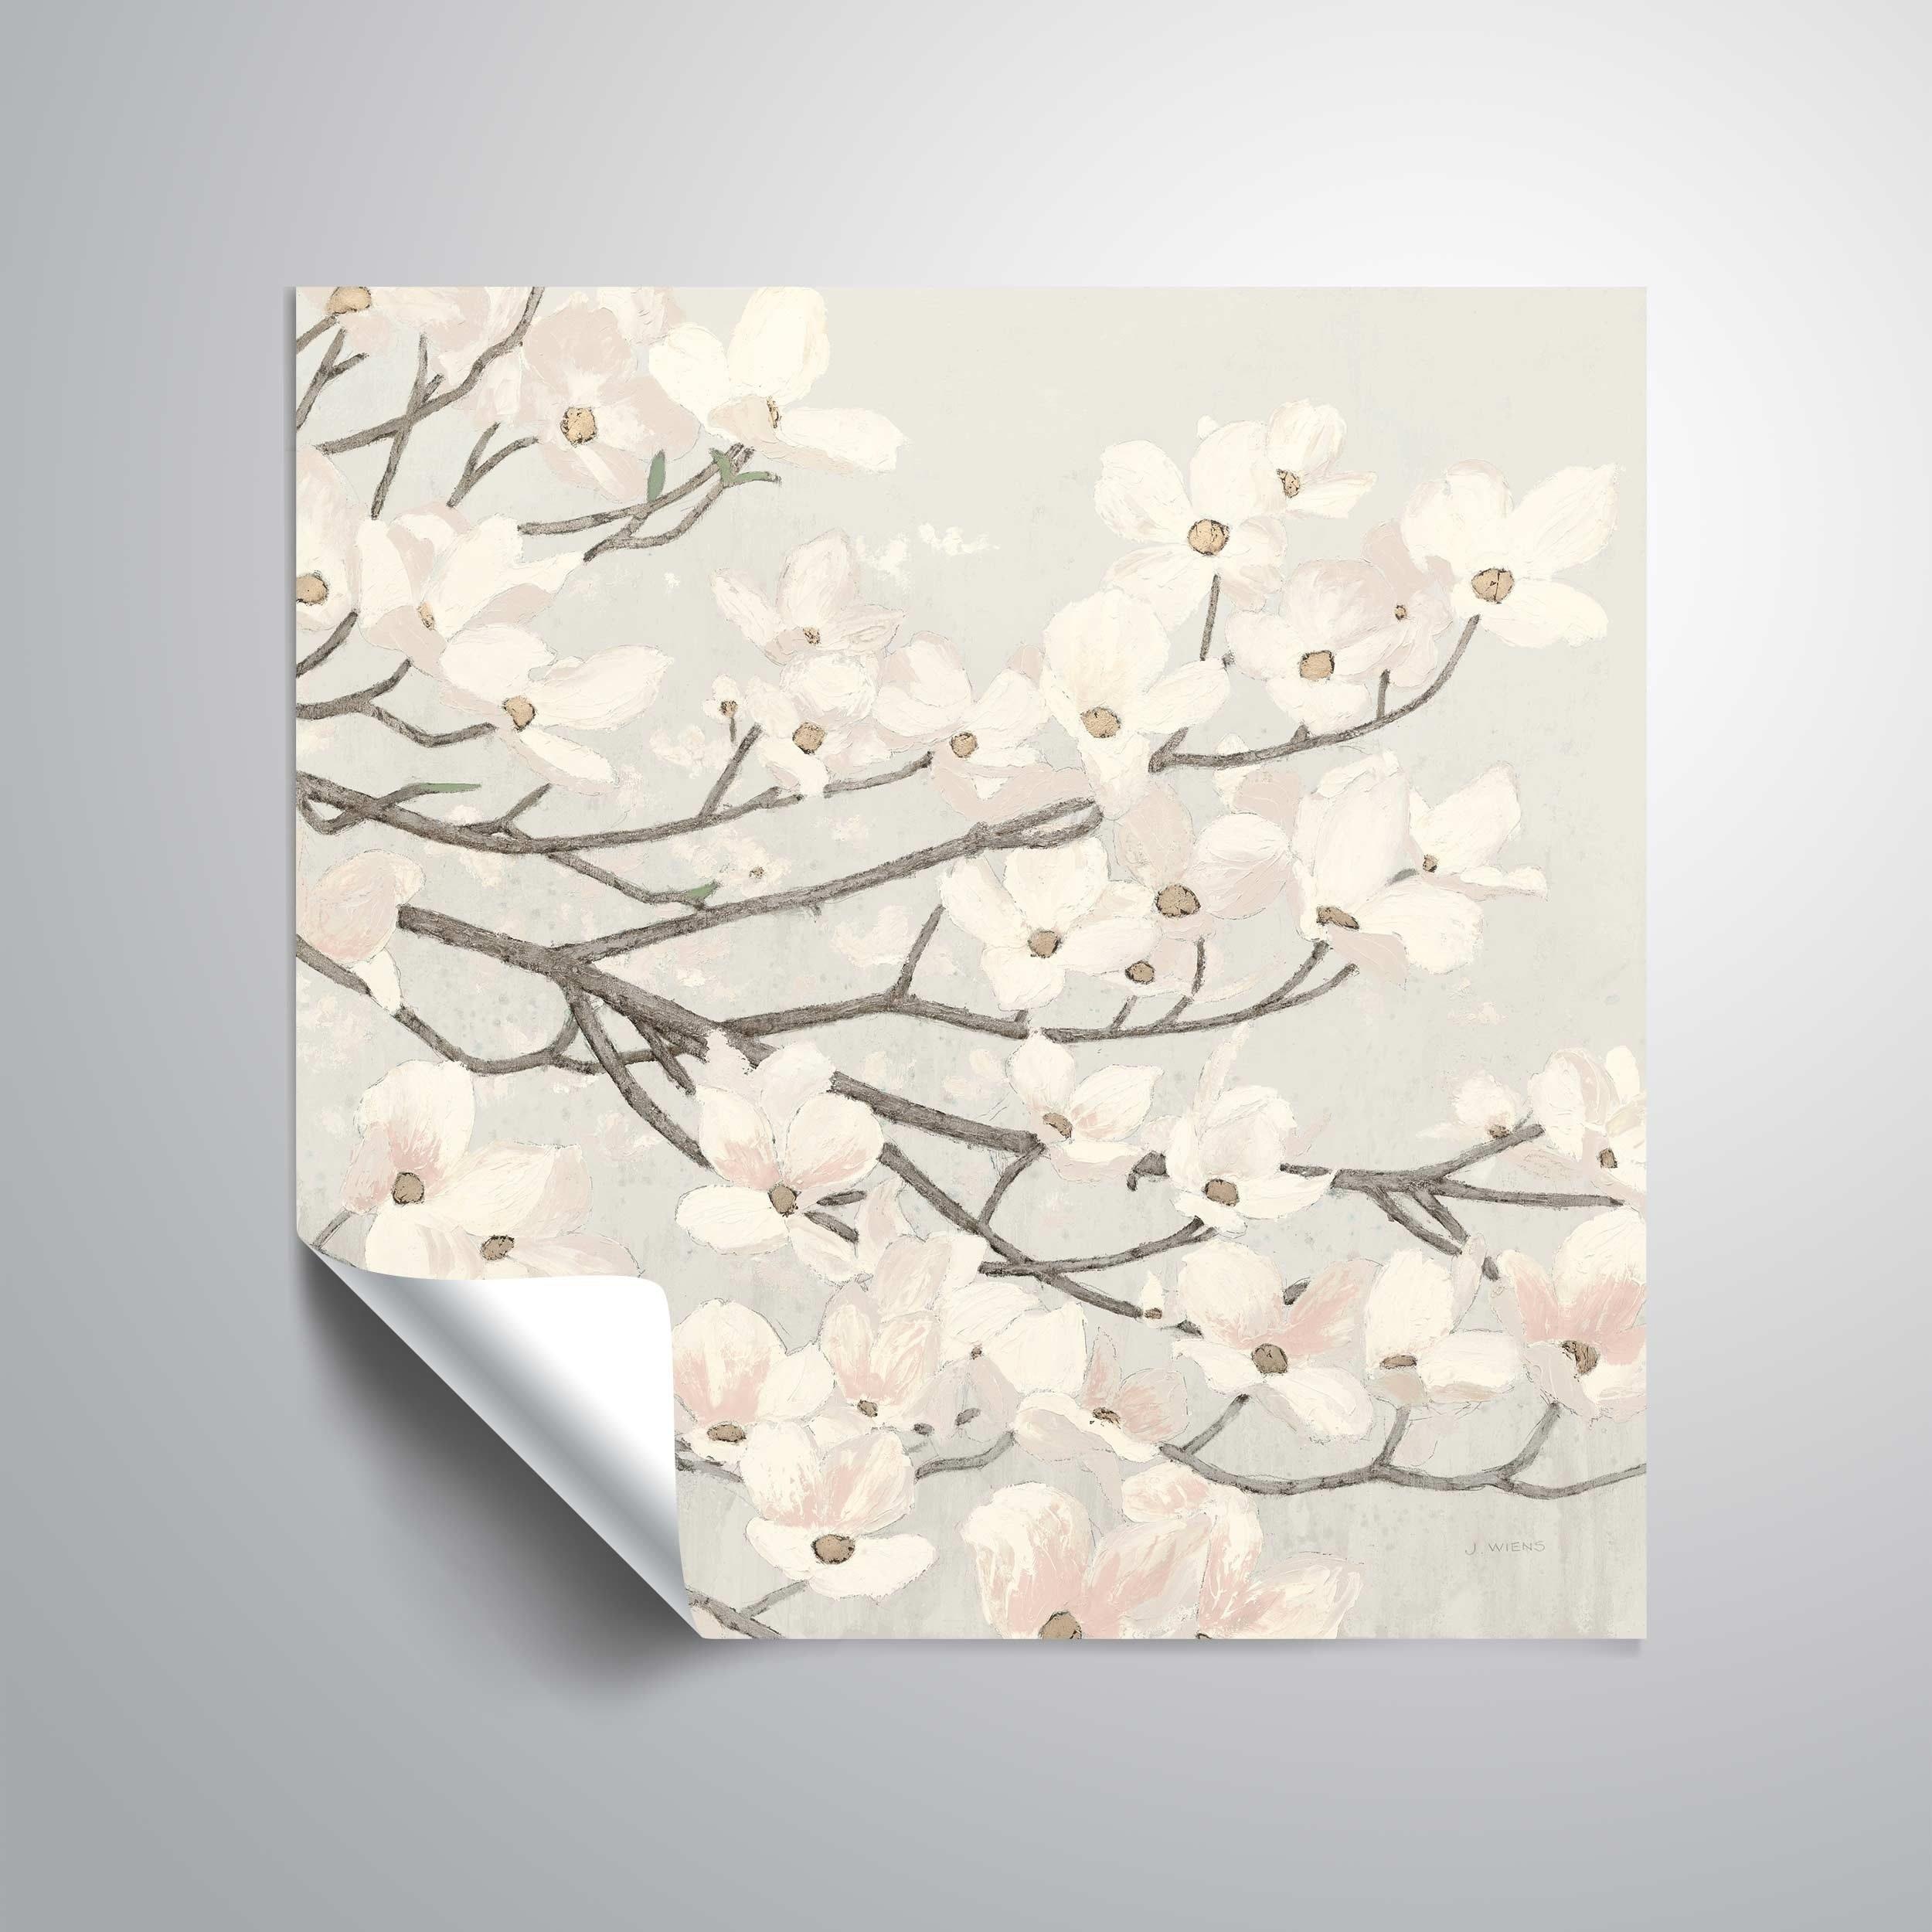 Artwall Dogwood Blossoms Ii Removable Wall Art Mural Overstock 26061297